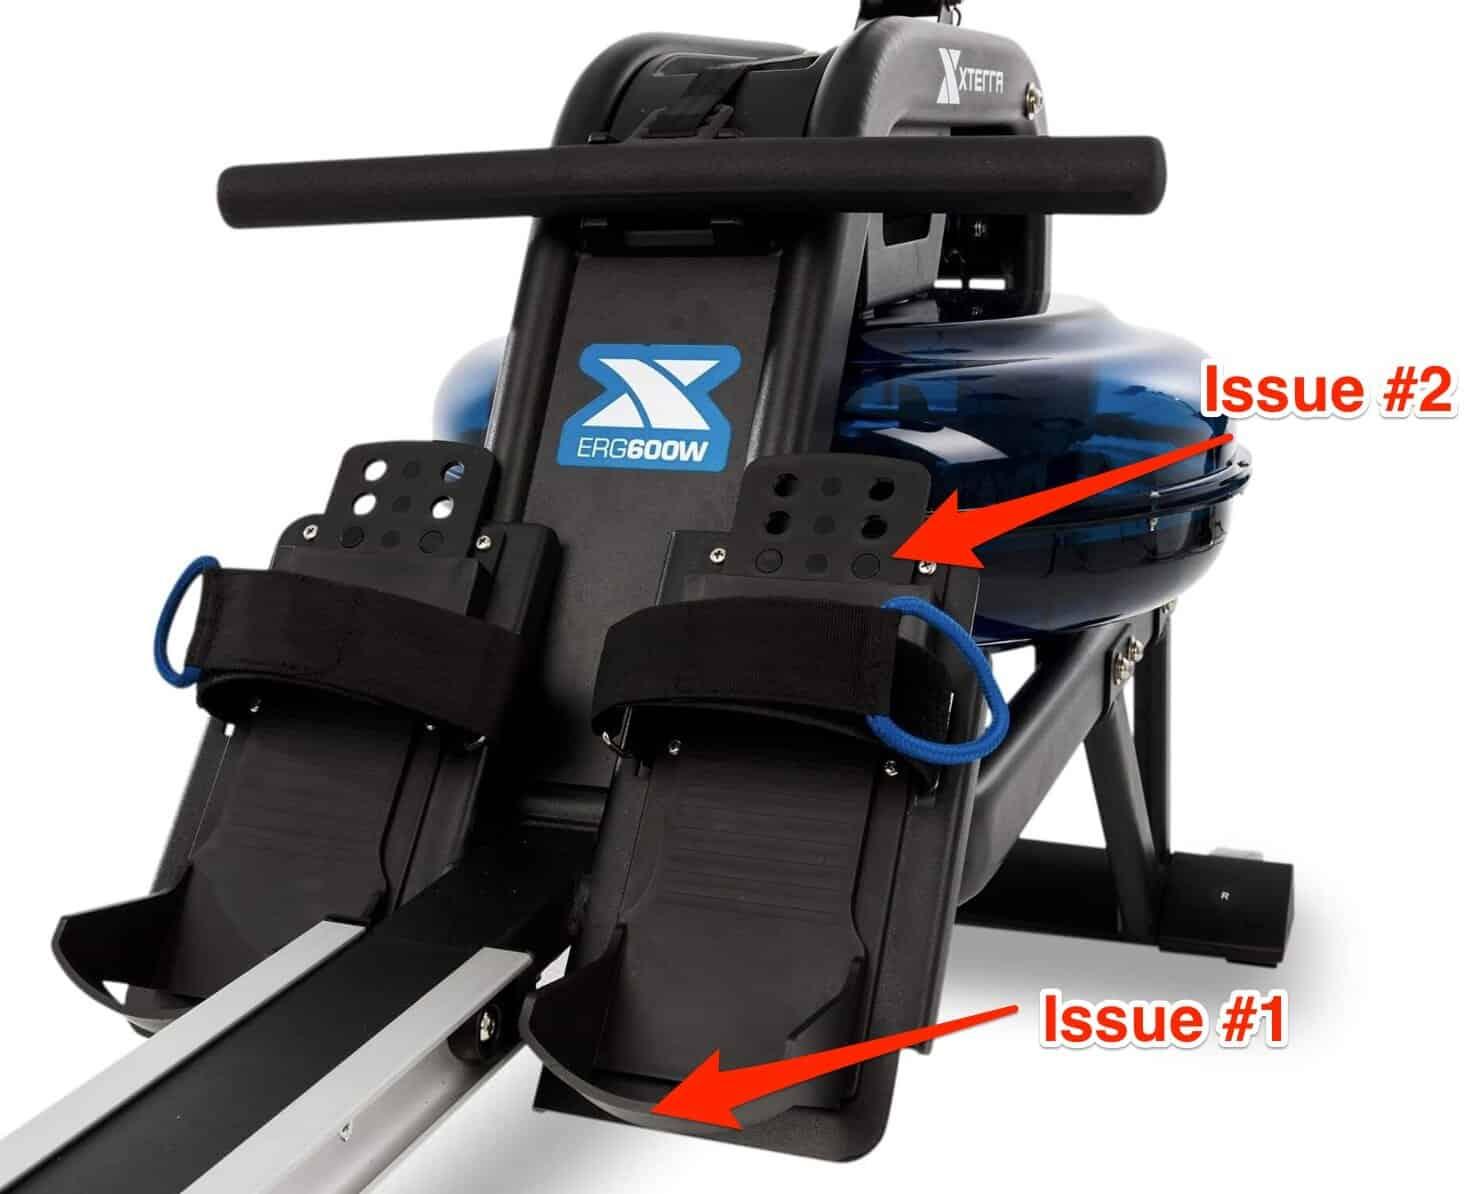 XTERRA ERG600 Quality Issue